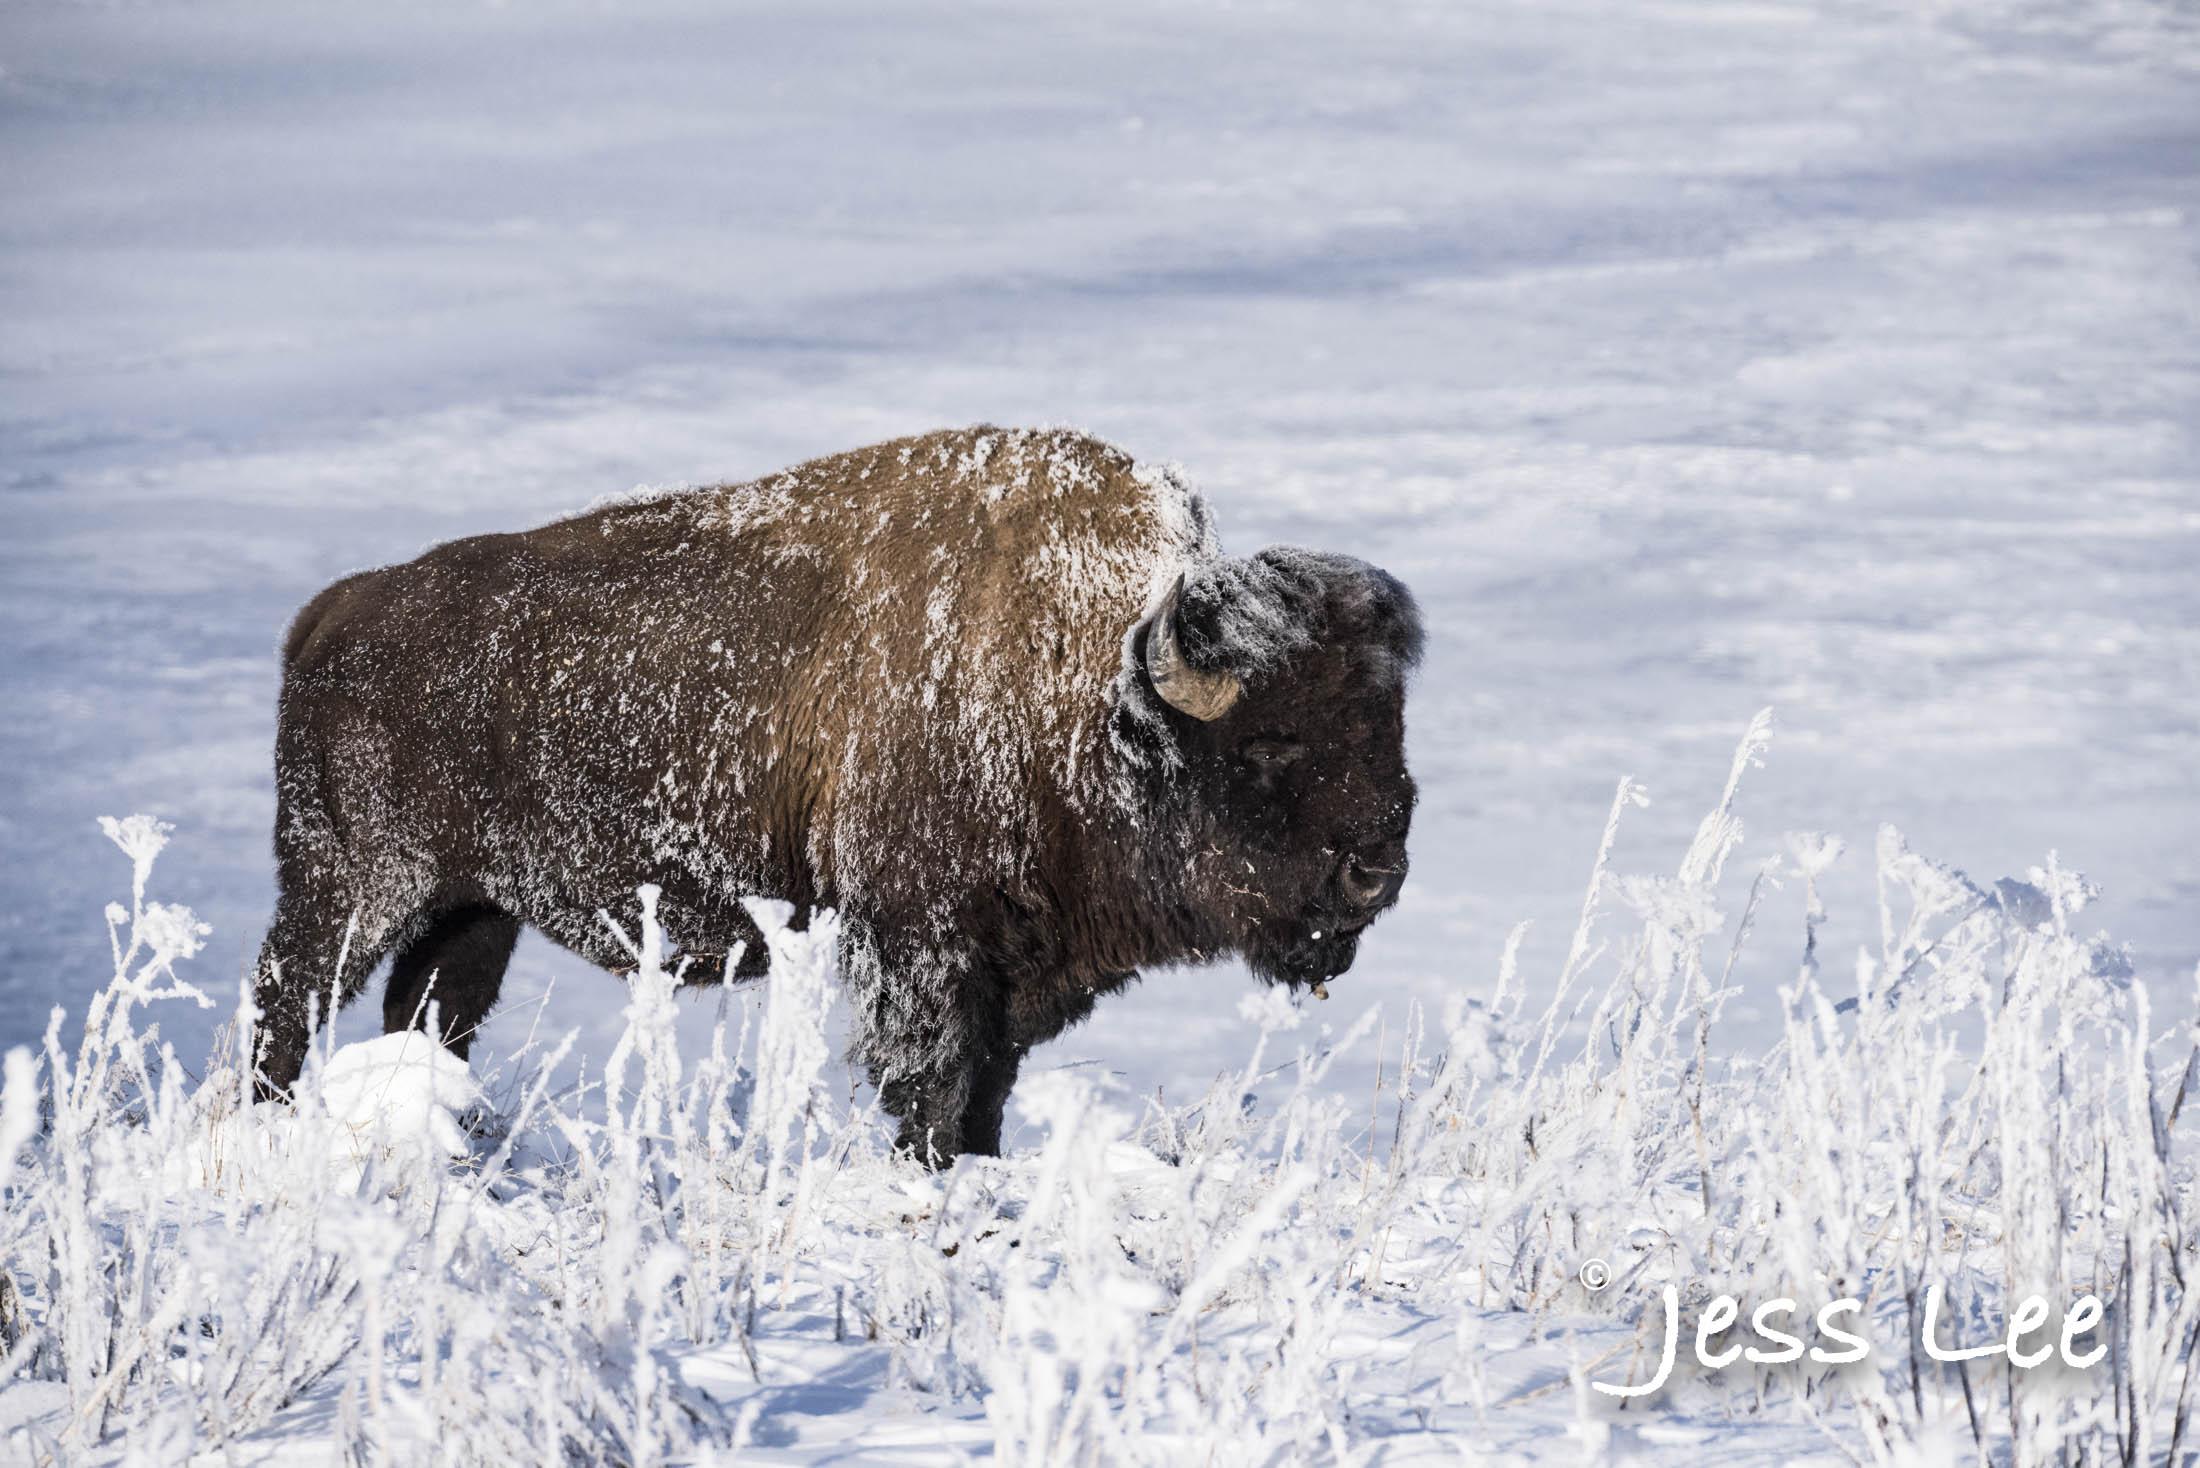 bisonfrost 2467 image